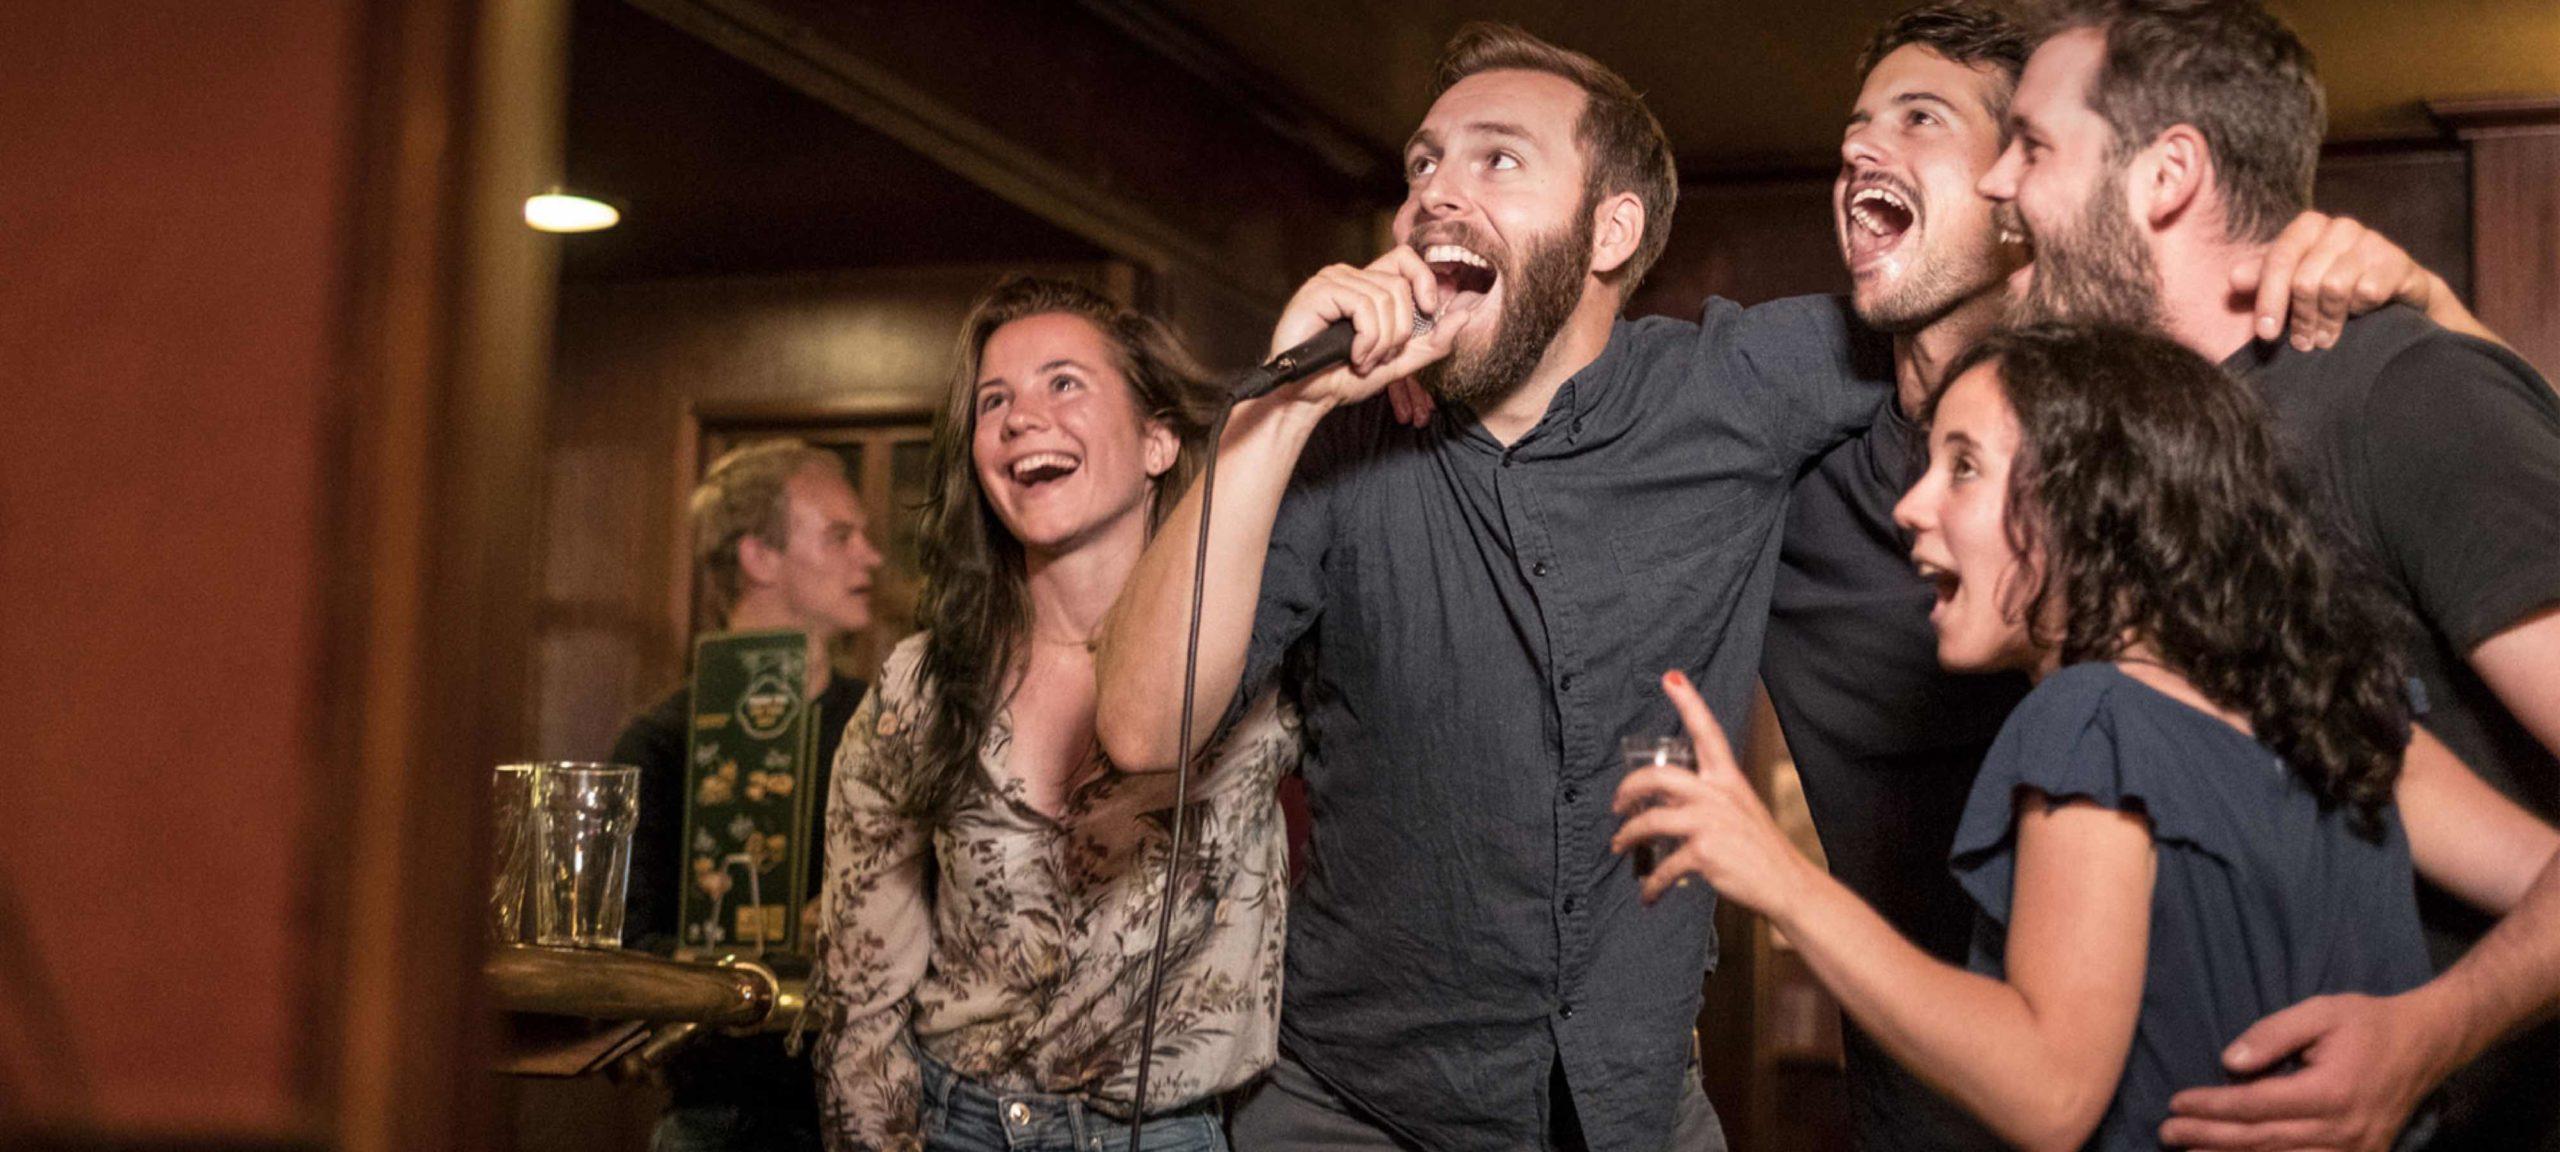 Karaoke Modd-Bild aus dem Pickwick Pub